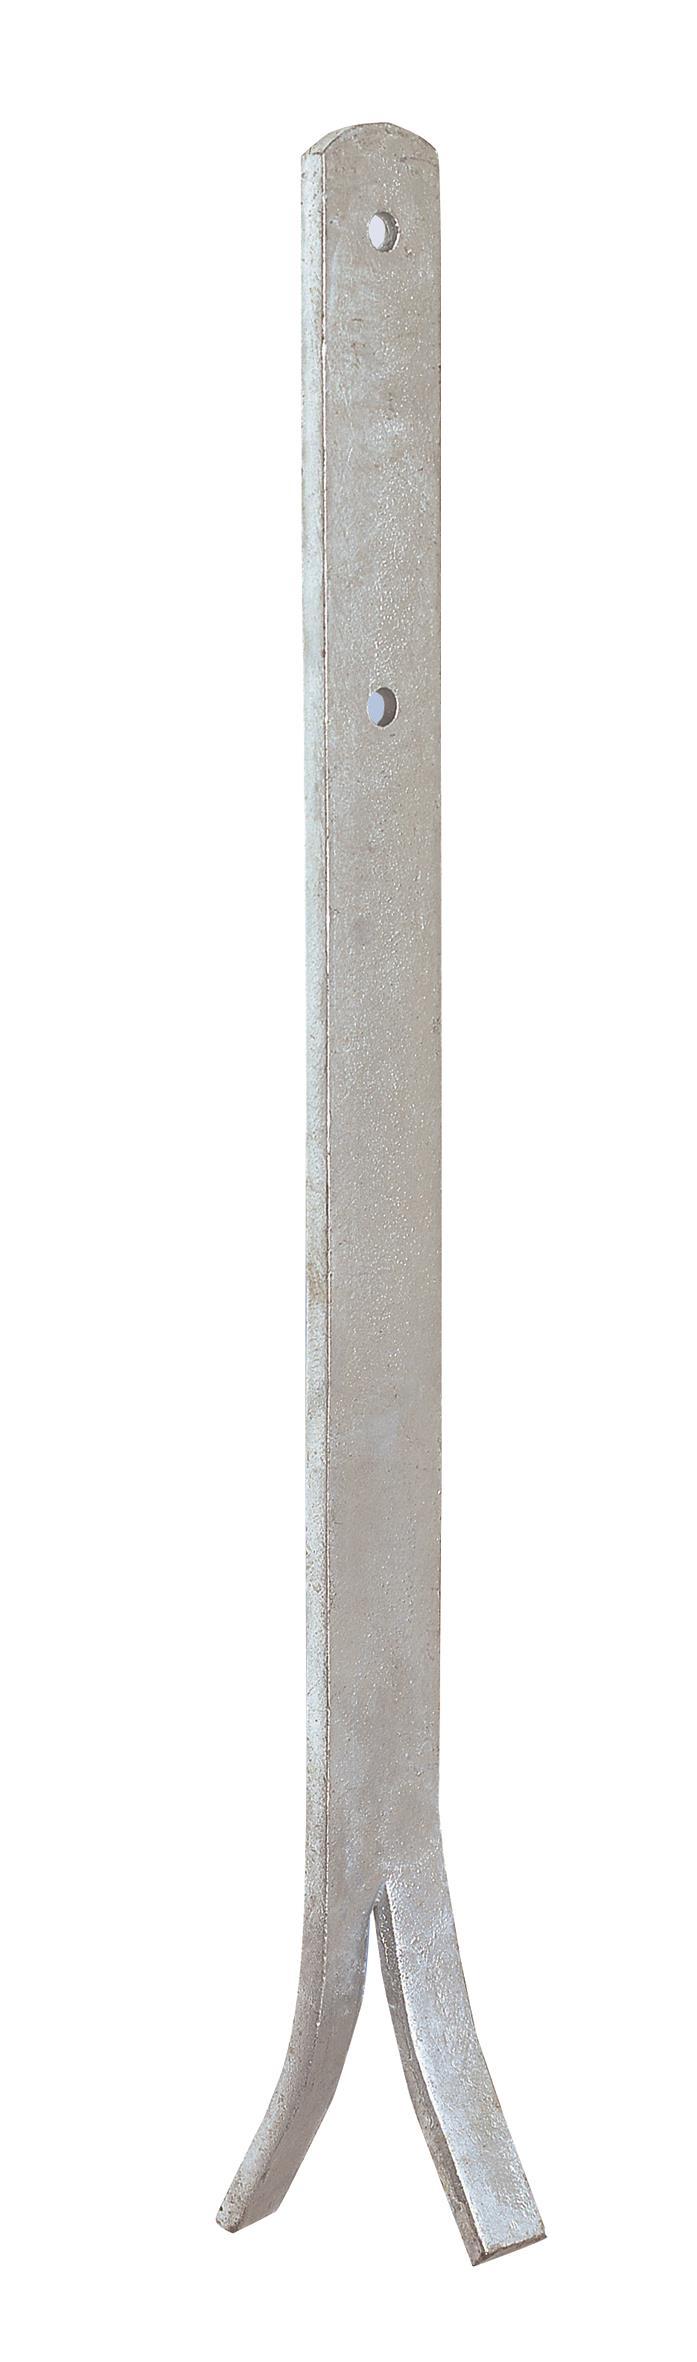 Joma 6140500 Stolpjärn 10-pack 40 x 500 x 8 x 12 mm